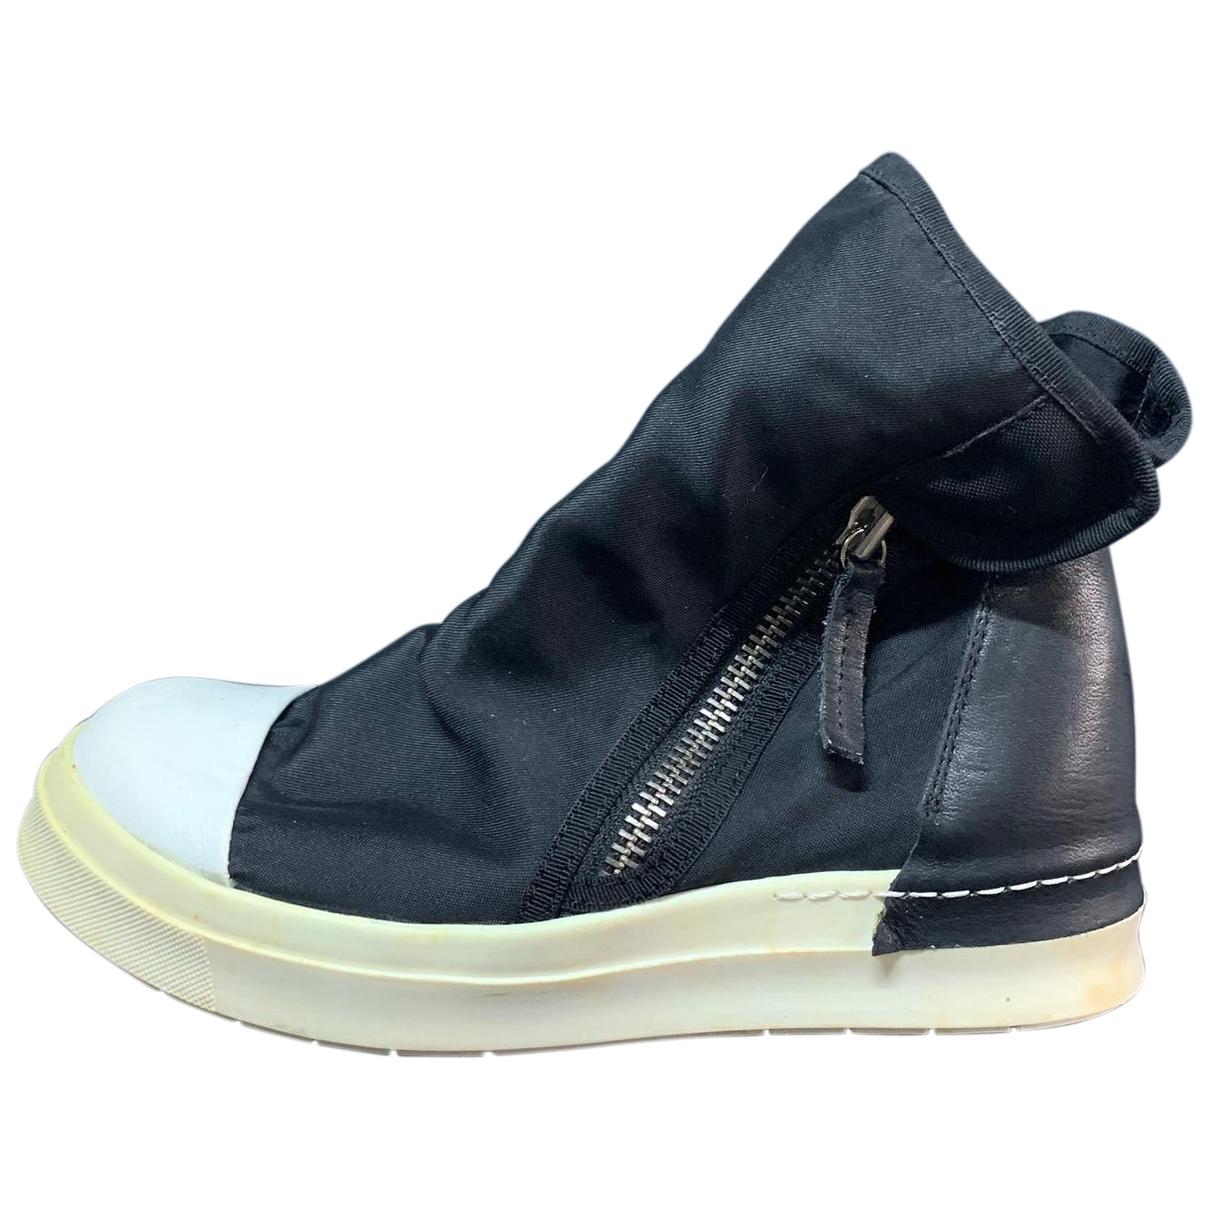 Cinzia Araia \N Sneakers in  Schwarz Leder